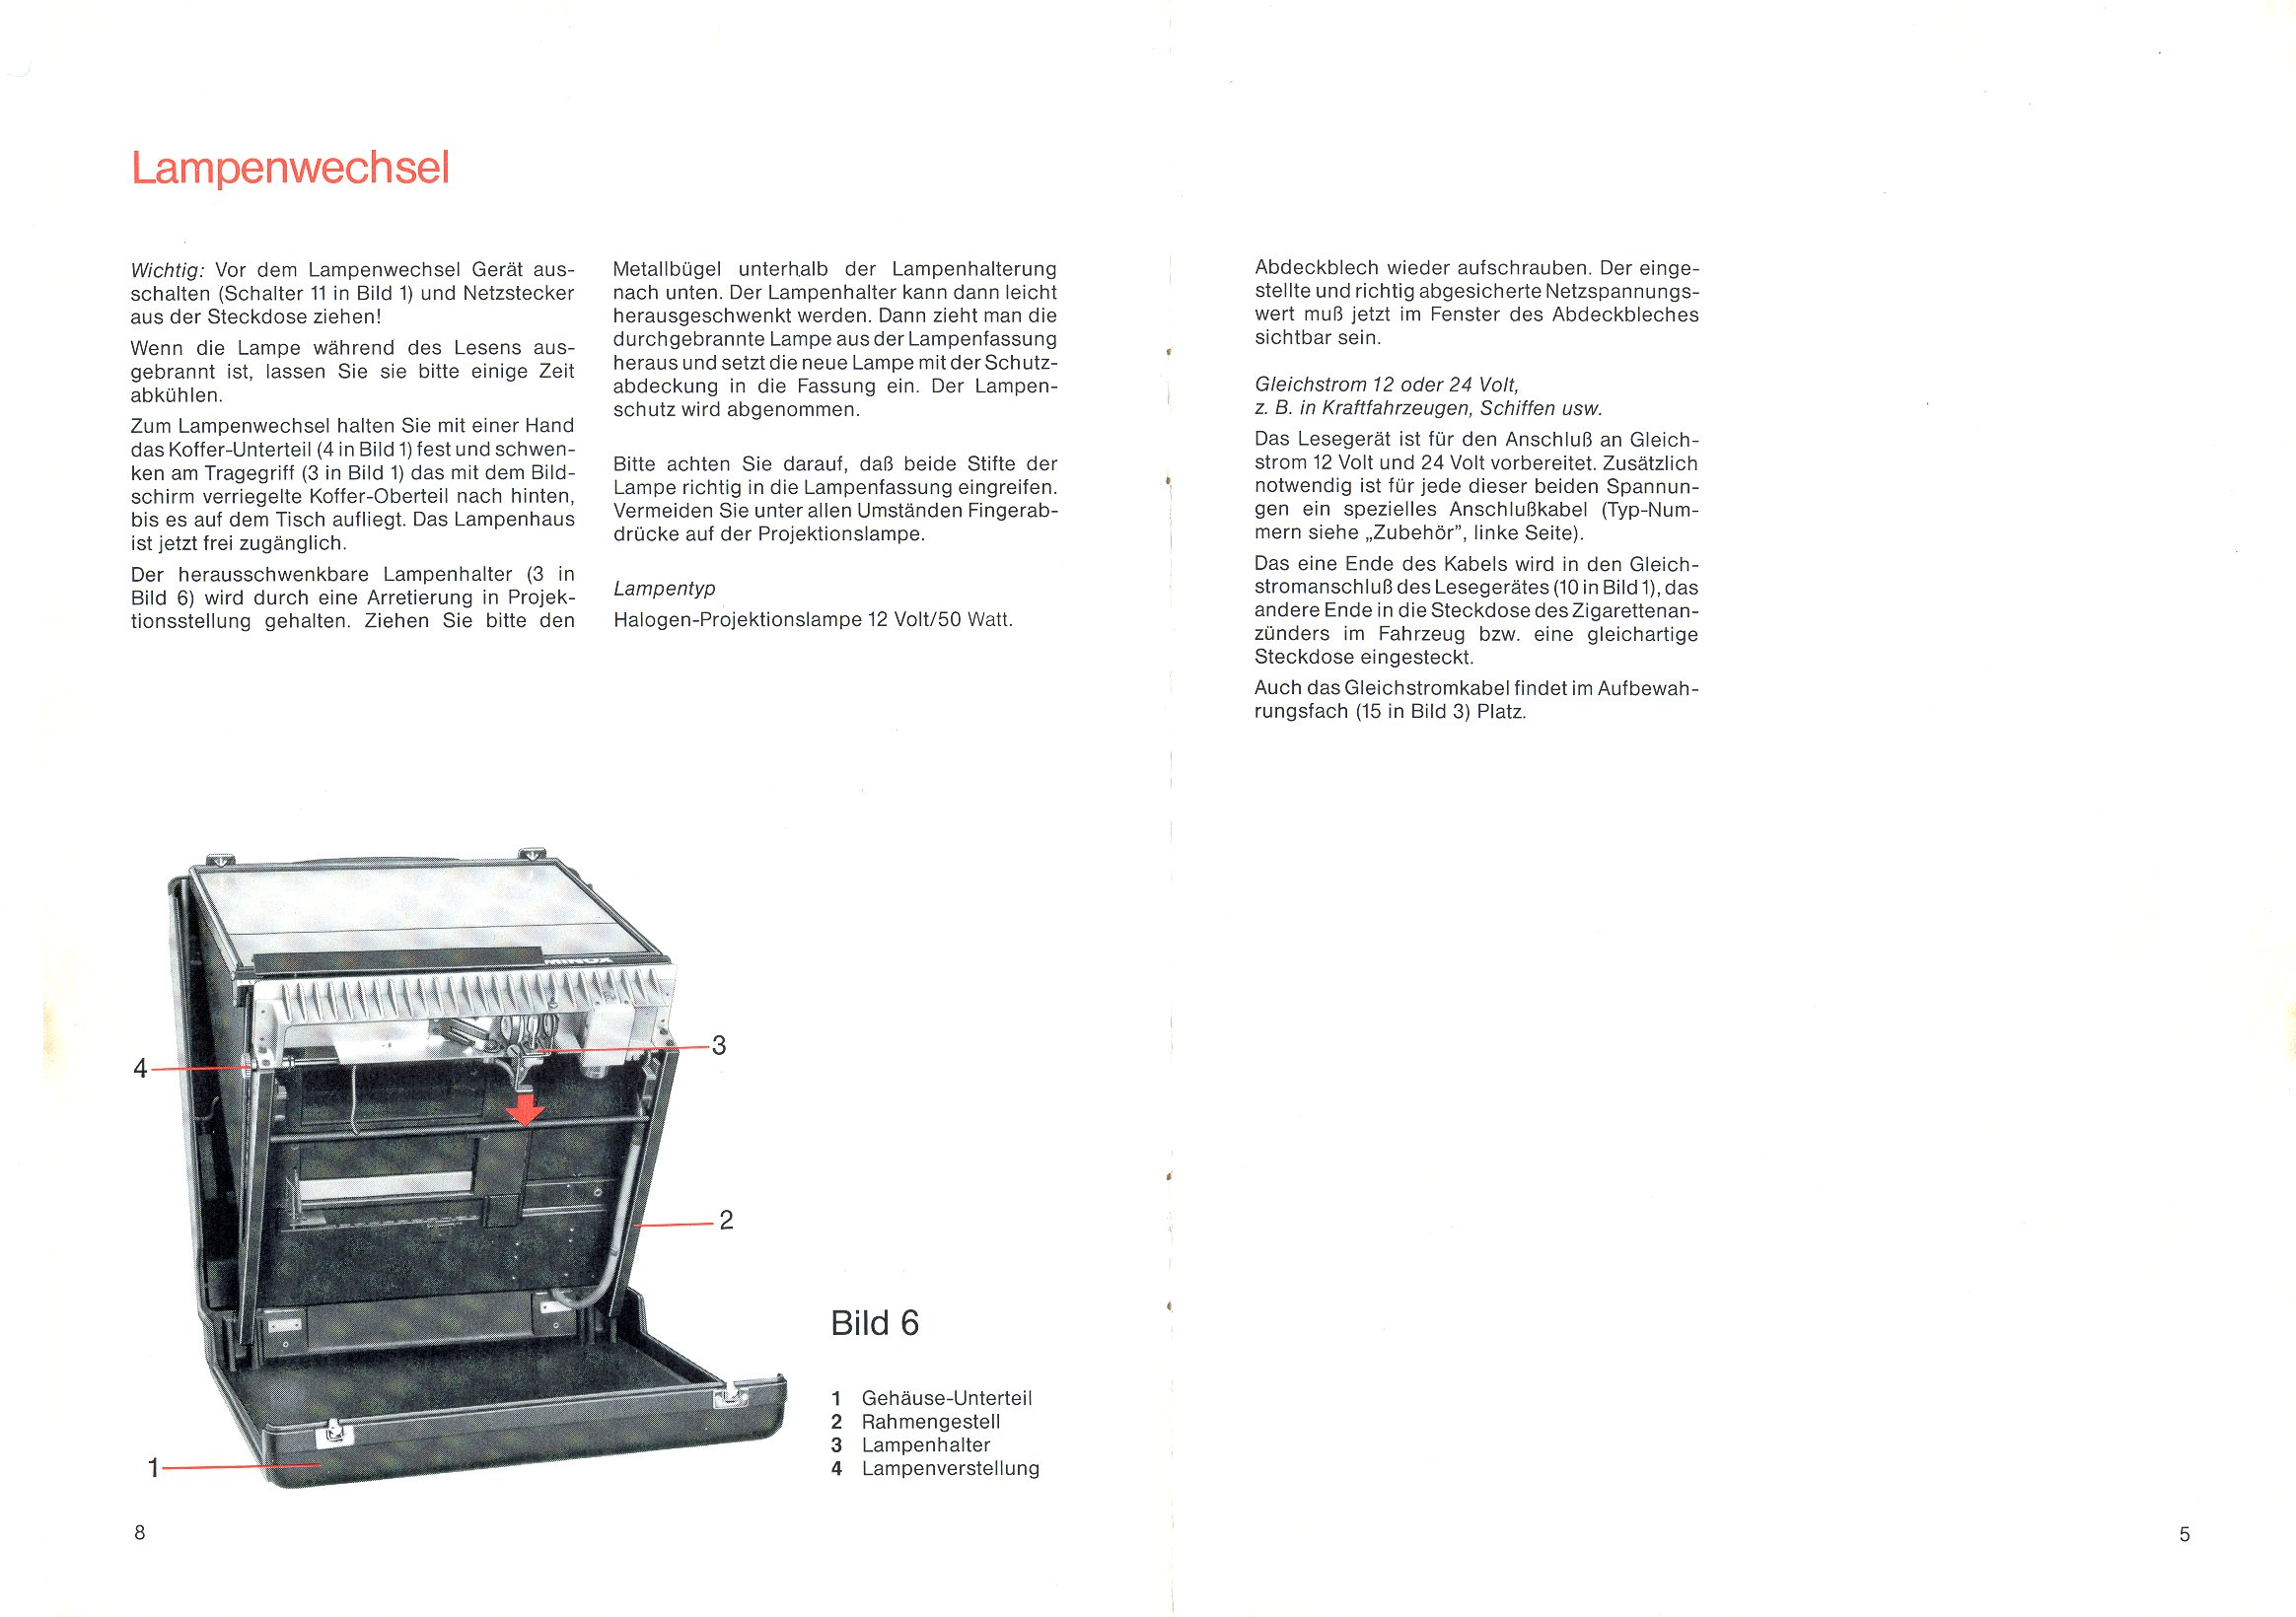 Minox Mikroplan Microfiche Reader Manual 83 06d